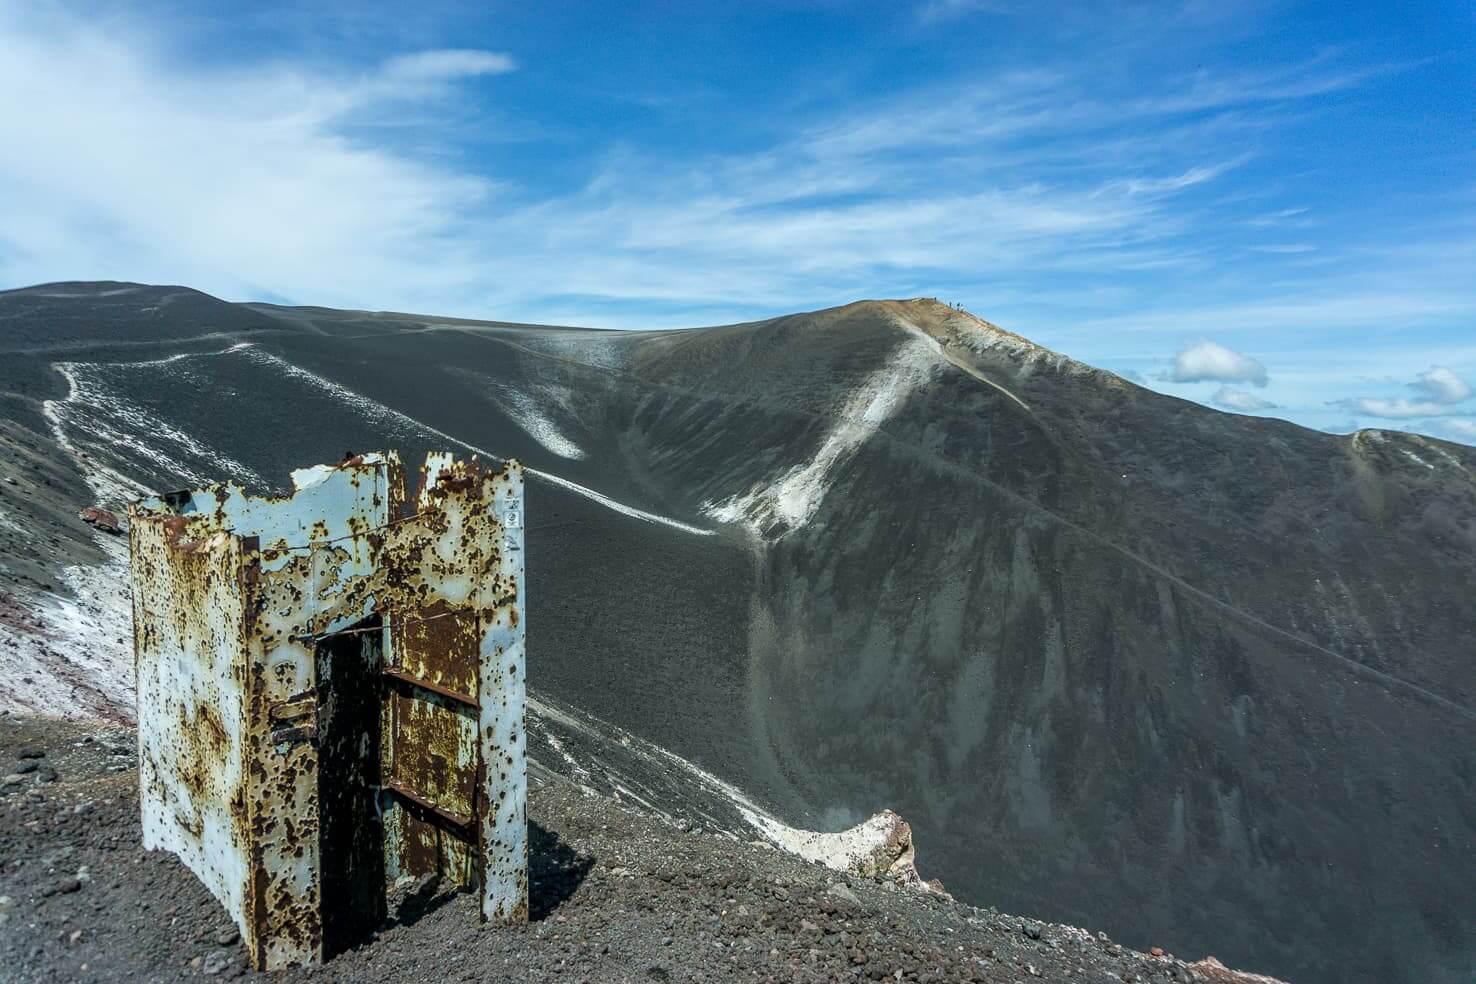 Cerro Negro volcano near Leon, Nicaragua